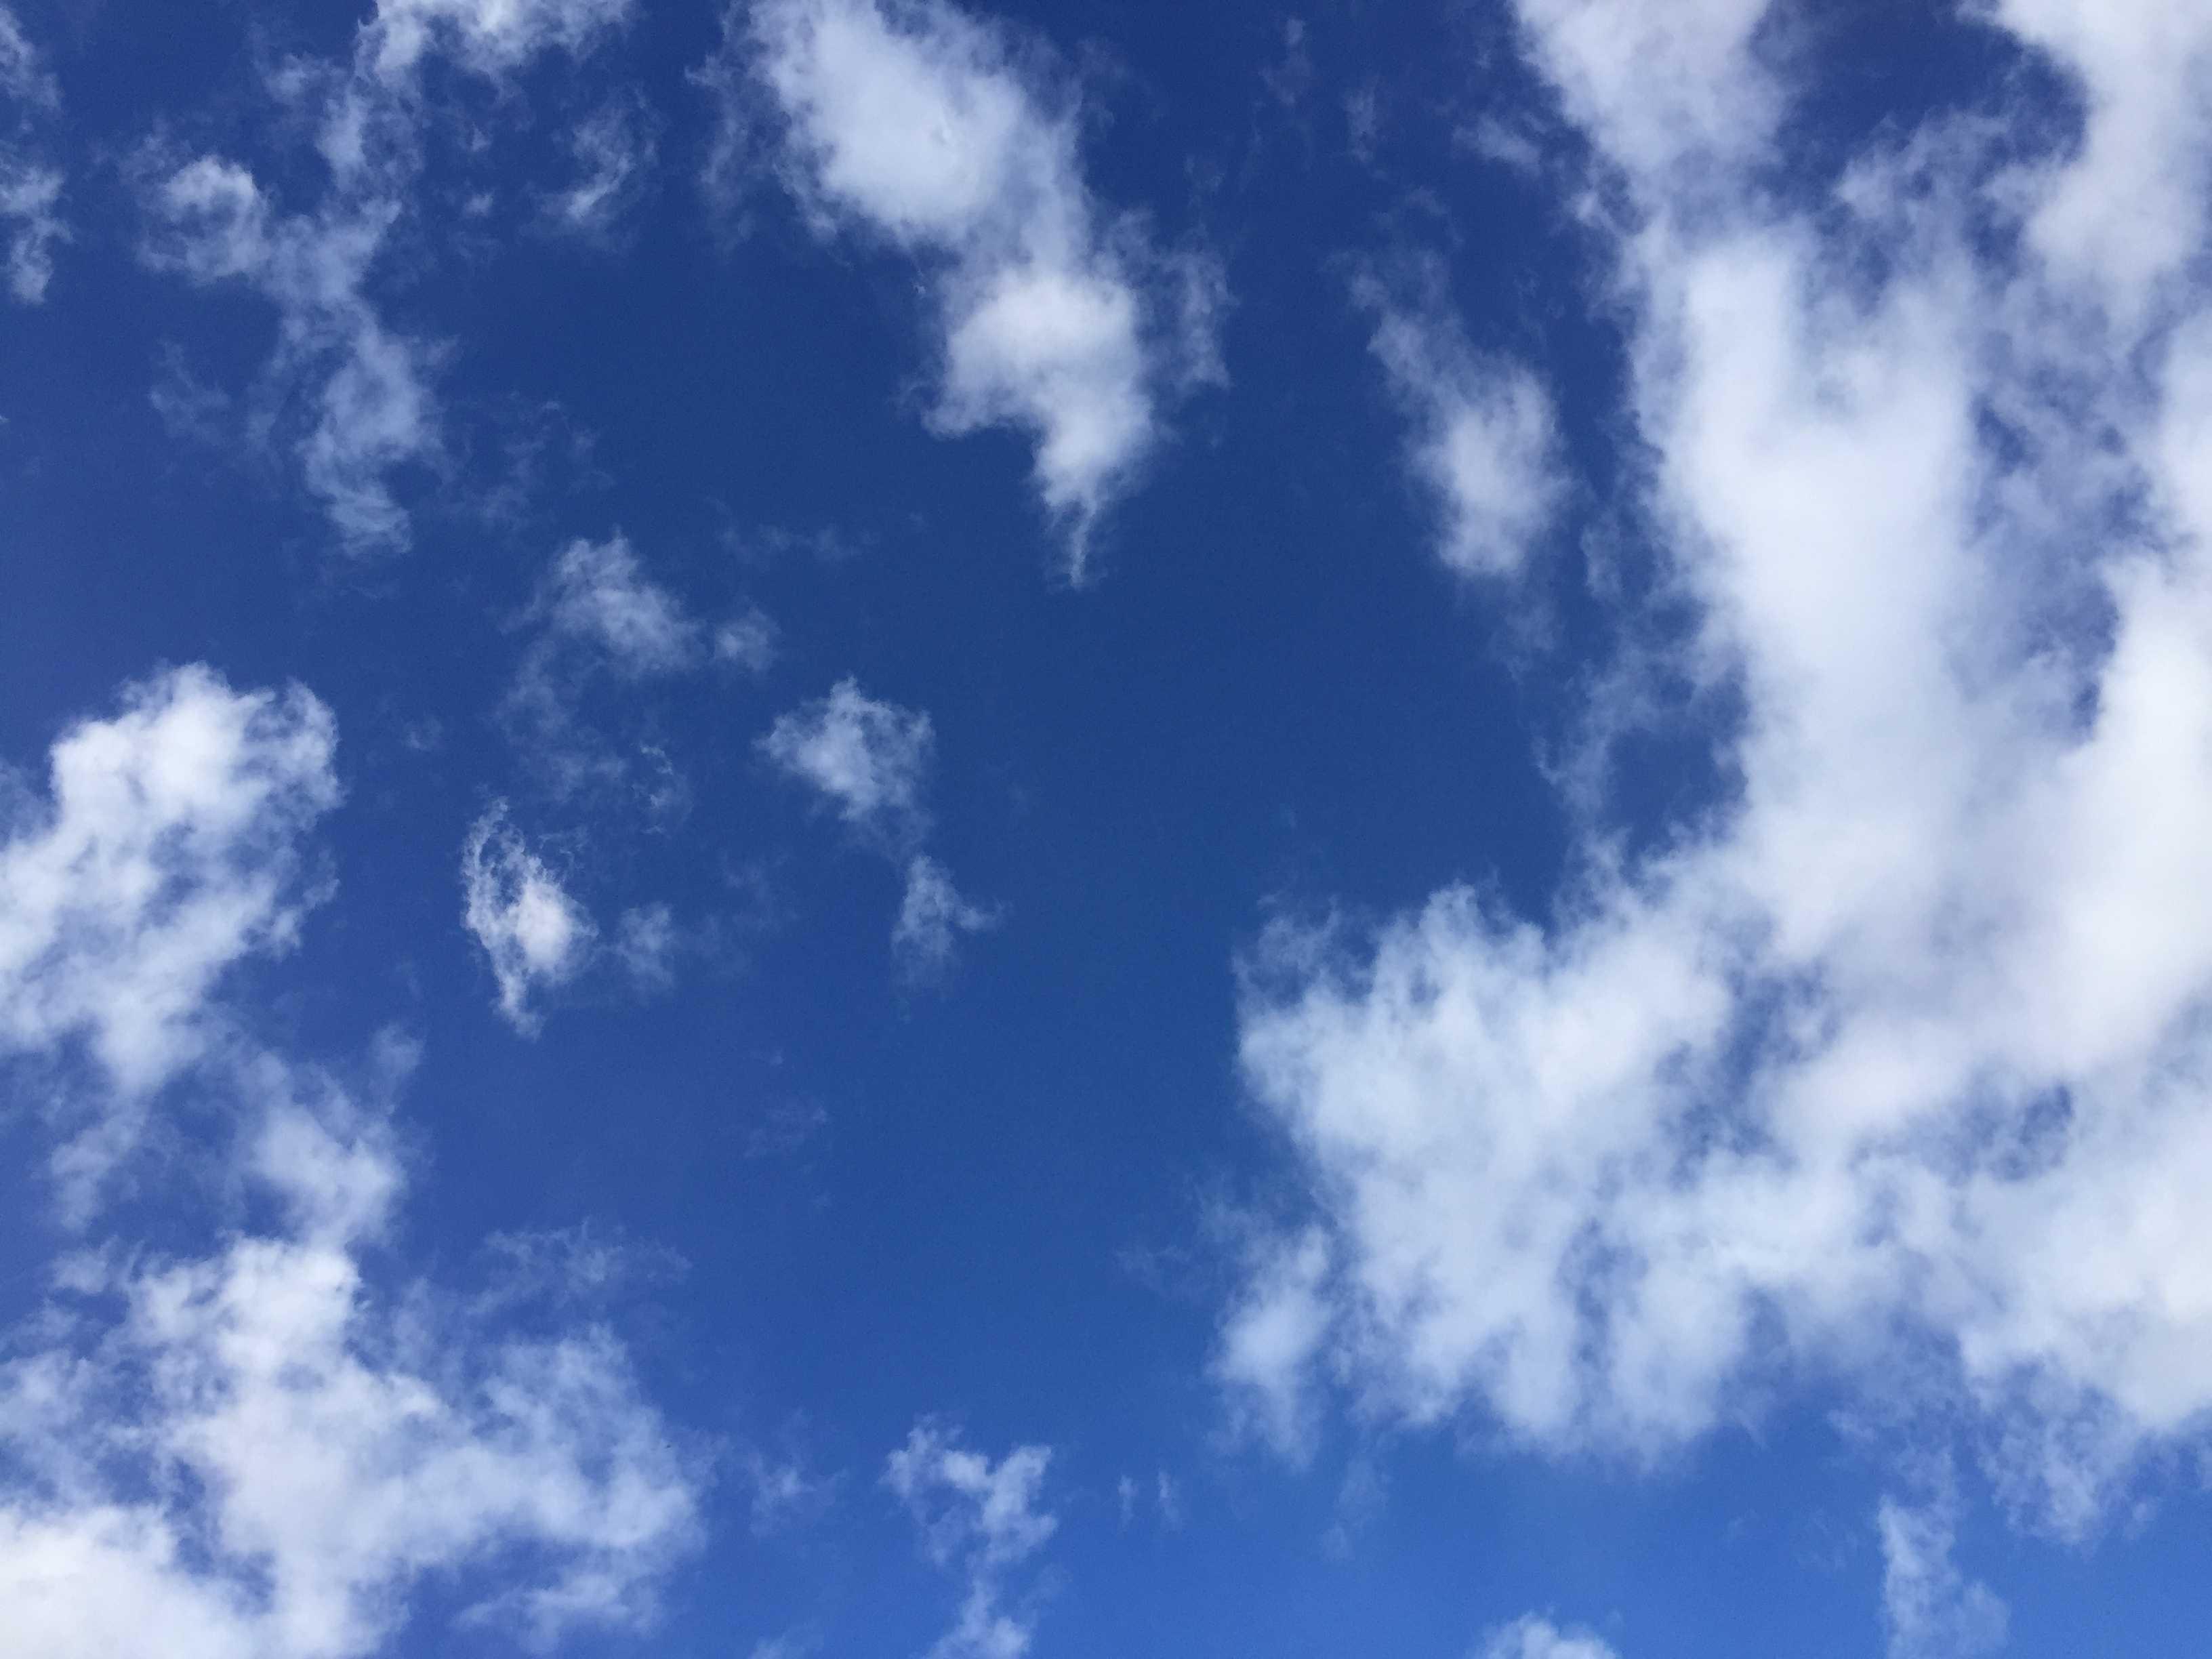 平成29年(2017年) 1月17日の空